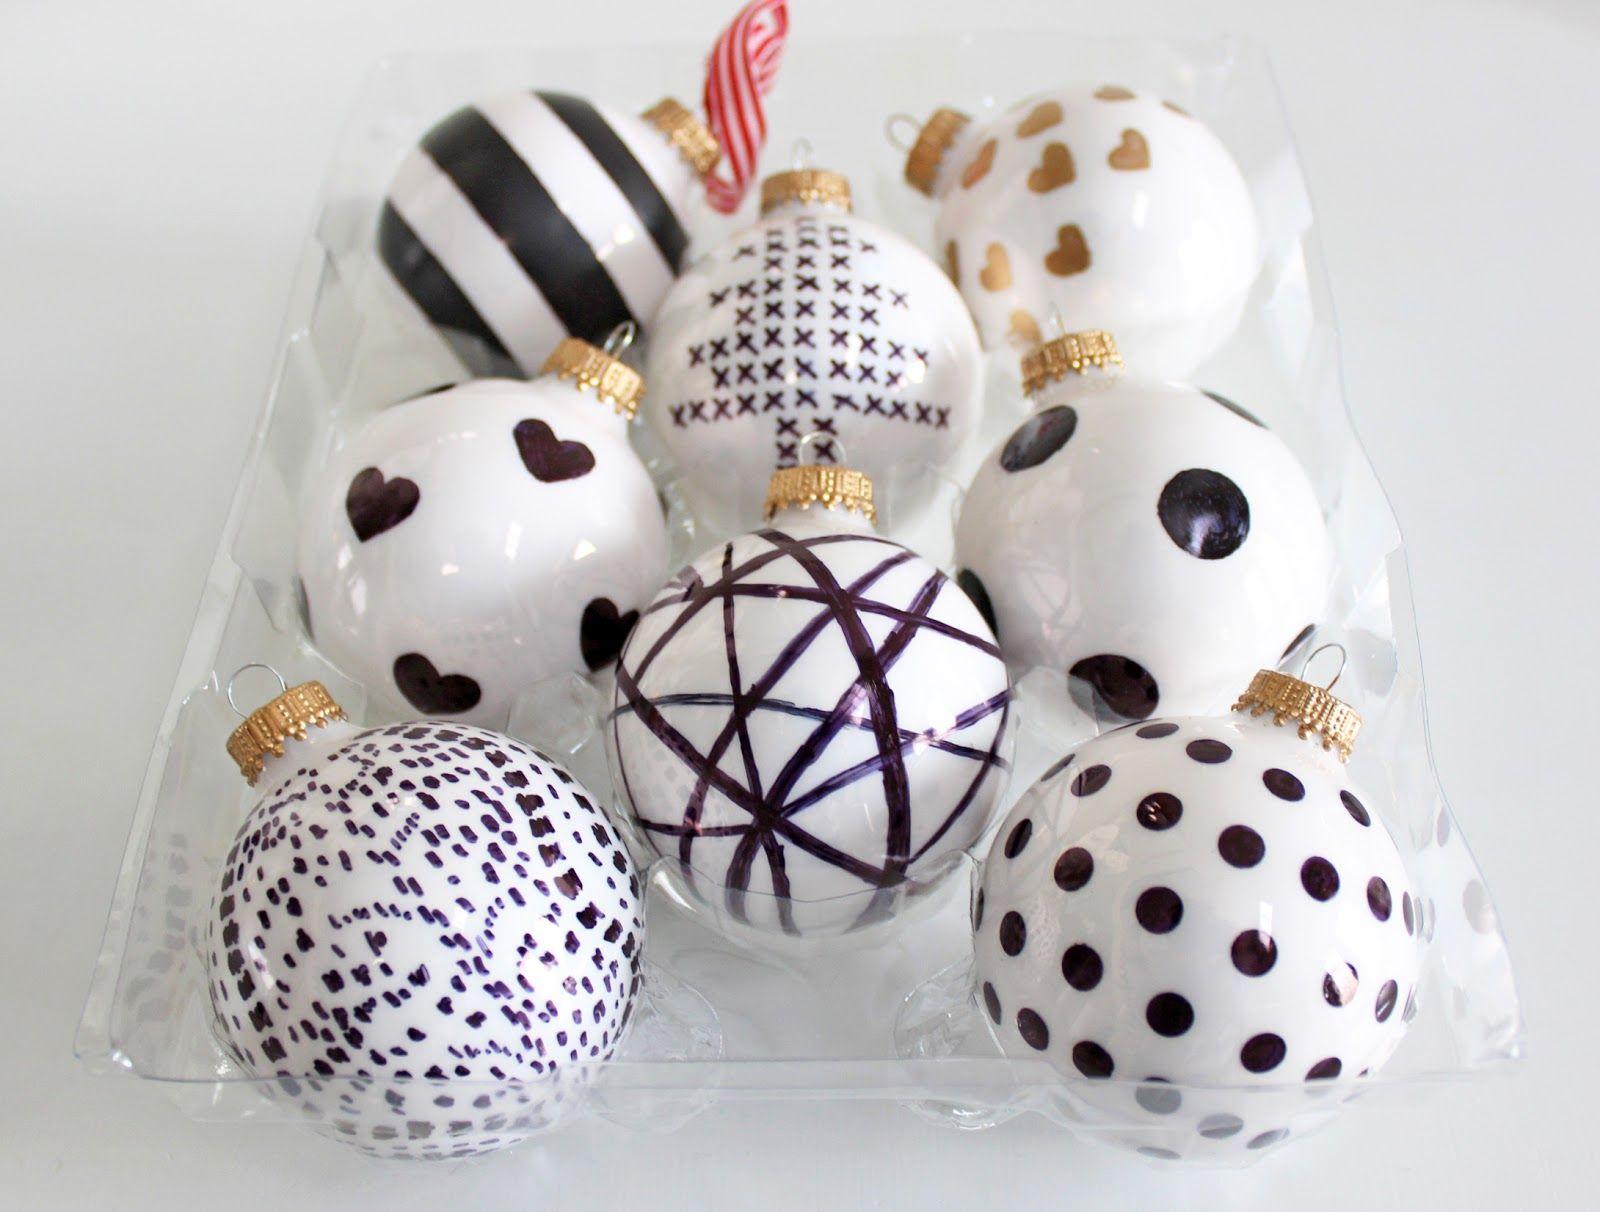 White christmas tree ball ornaments - Am Dolce Vita Diy Handpainted Holiday Ball Ornaments Diy Ball Ornaments Black White Themed Christmas Treesbeaded